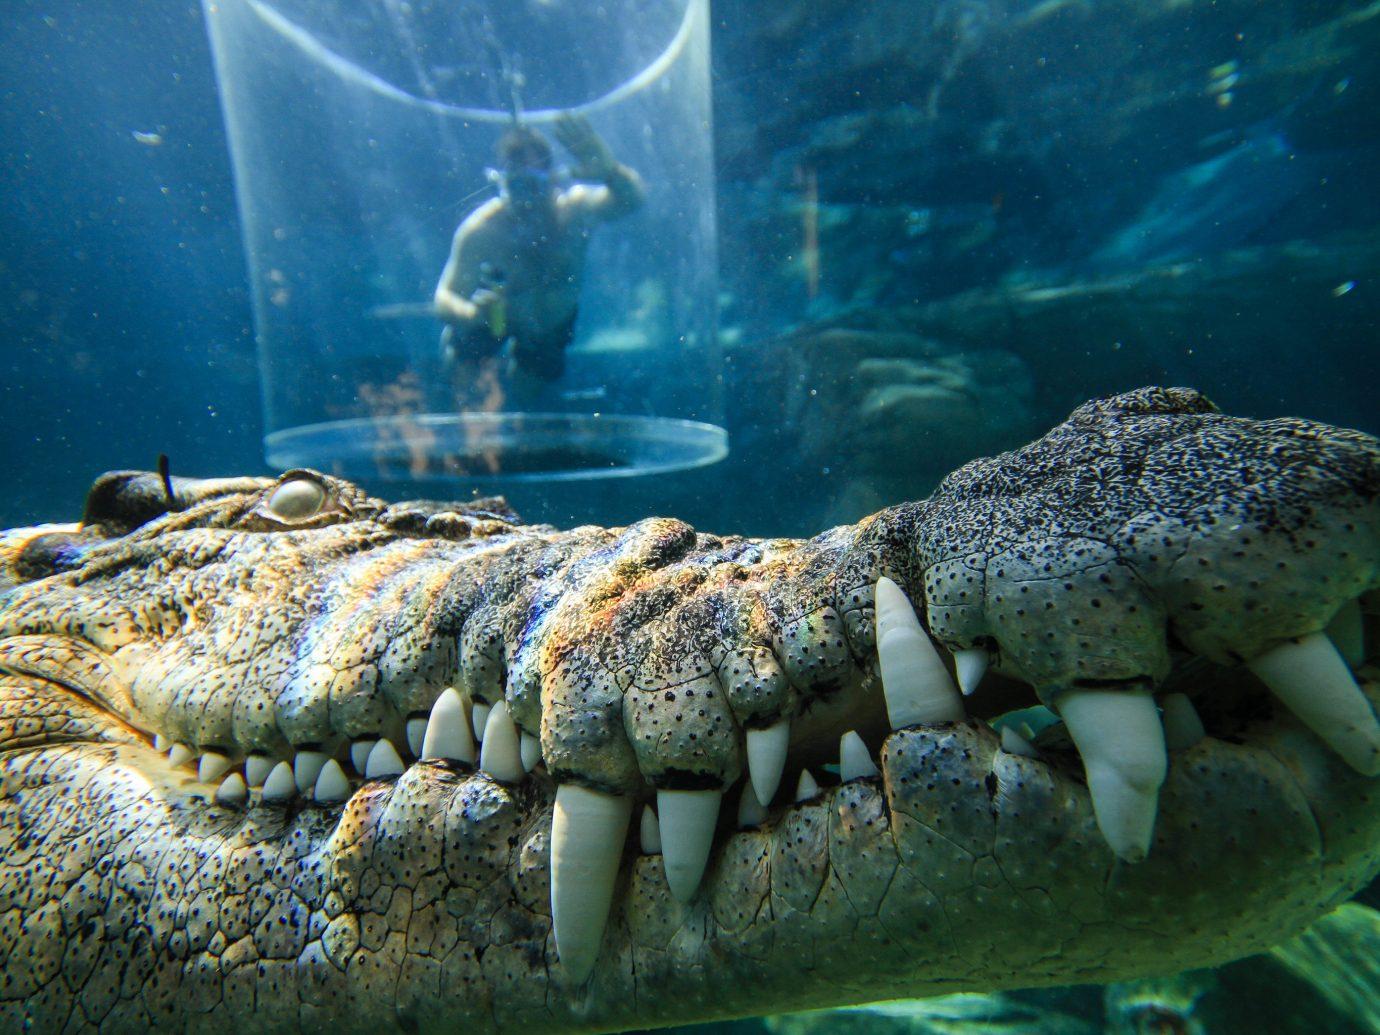 Trip Ideas animal crocodilia water underwater marine biology organism crocodile reptile alligator fish